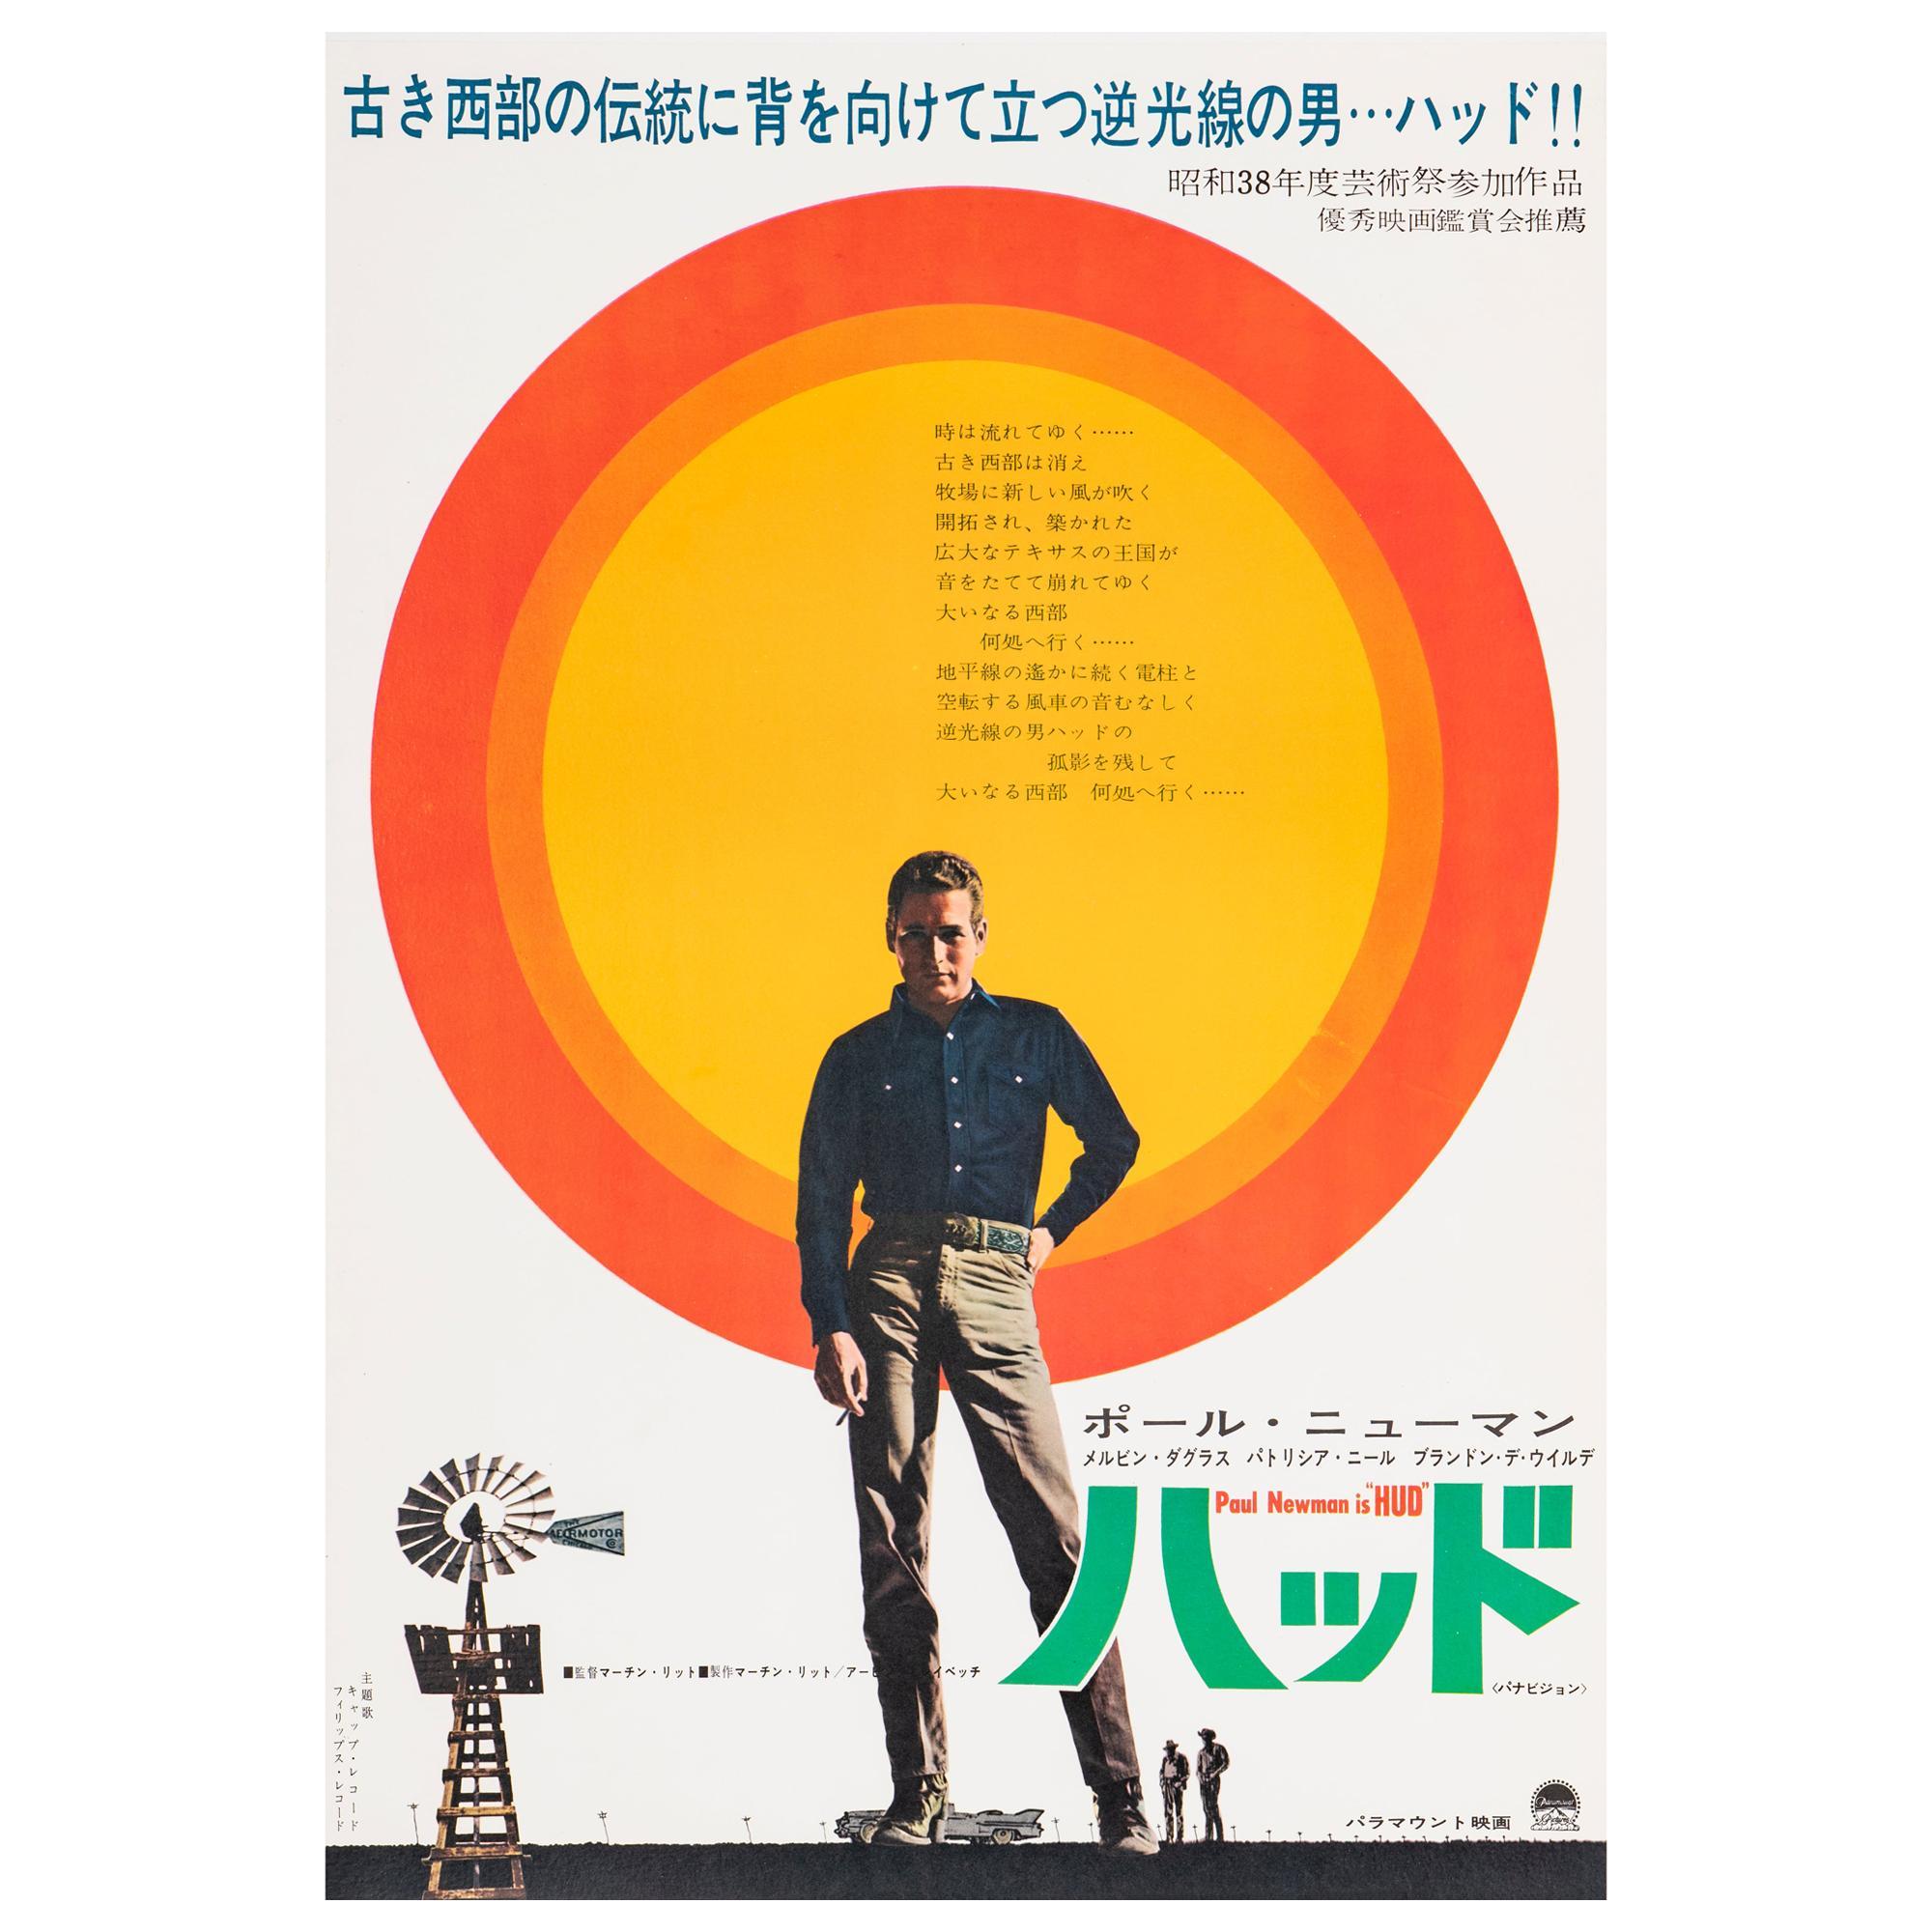 Paul Newman 'Hud' Original Vintage Movie Poster, Japanese, 1963